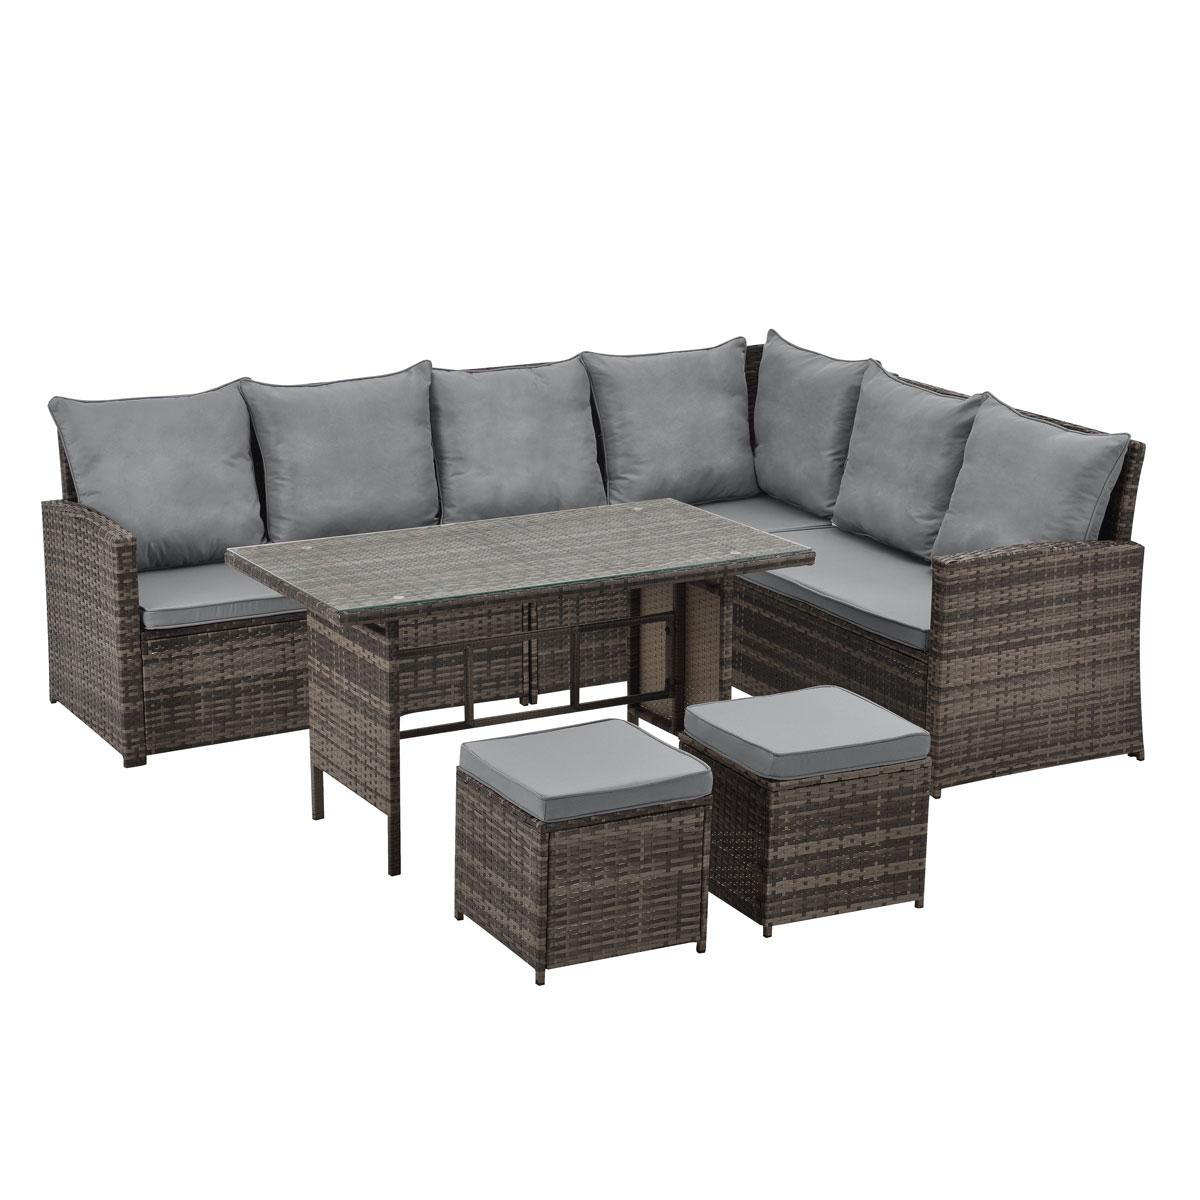 90721 SVITA Monroe Garten-Lounge Set Polyrattan Lounge-Möbel Sitzgruppe Braun